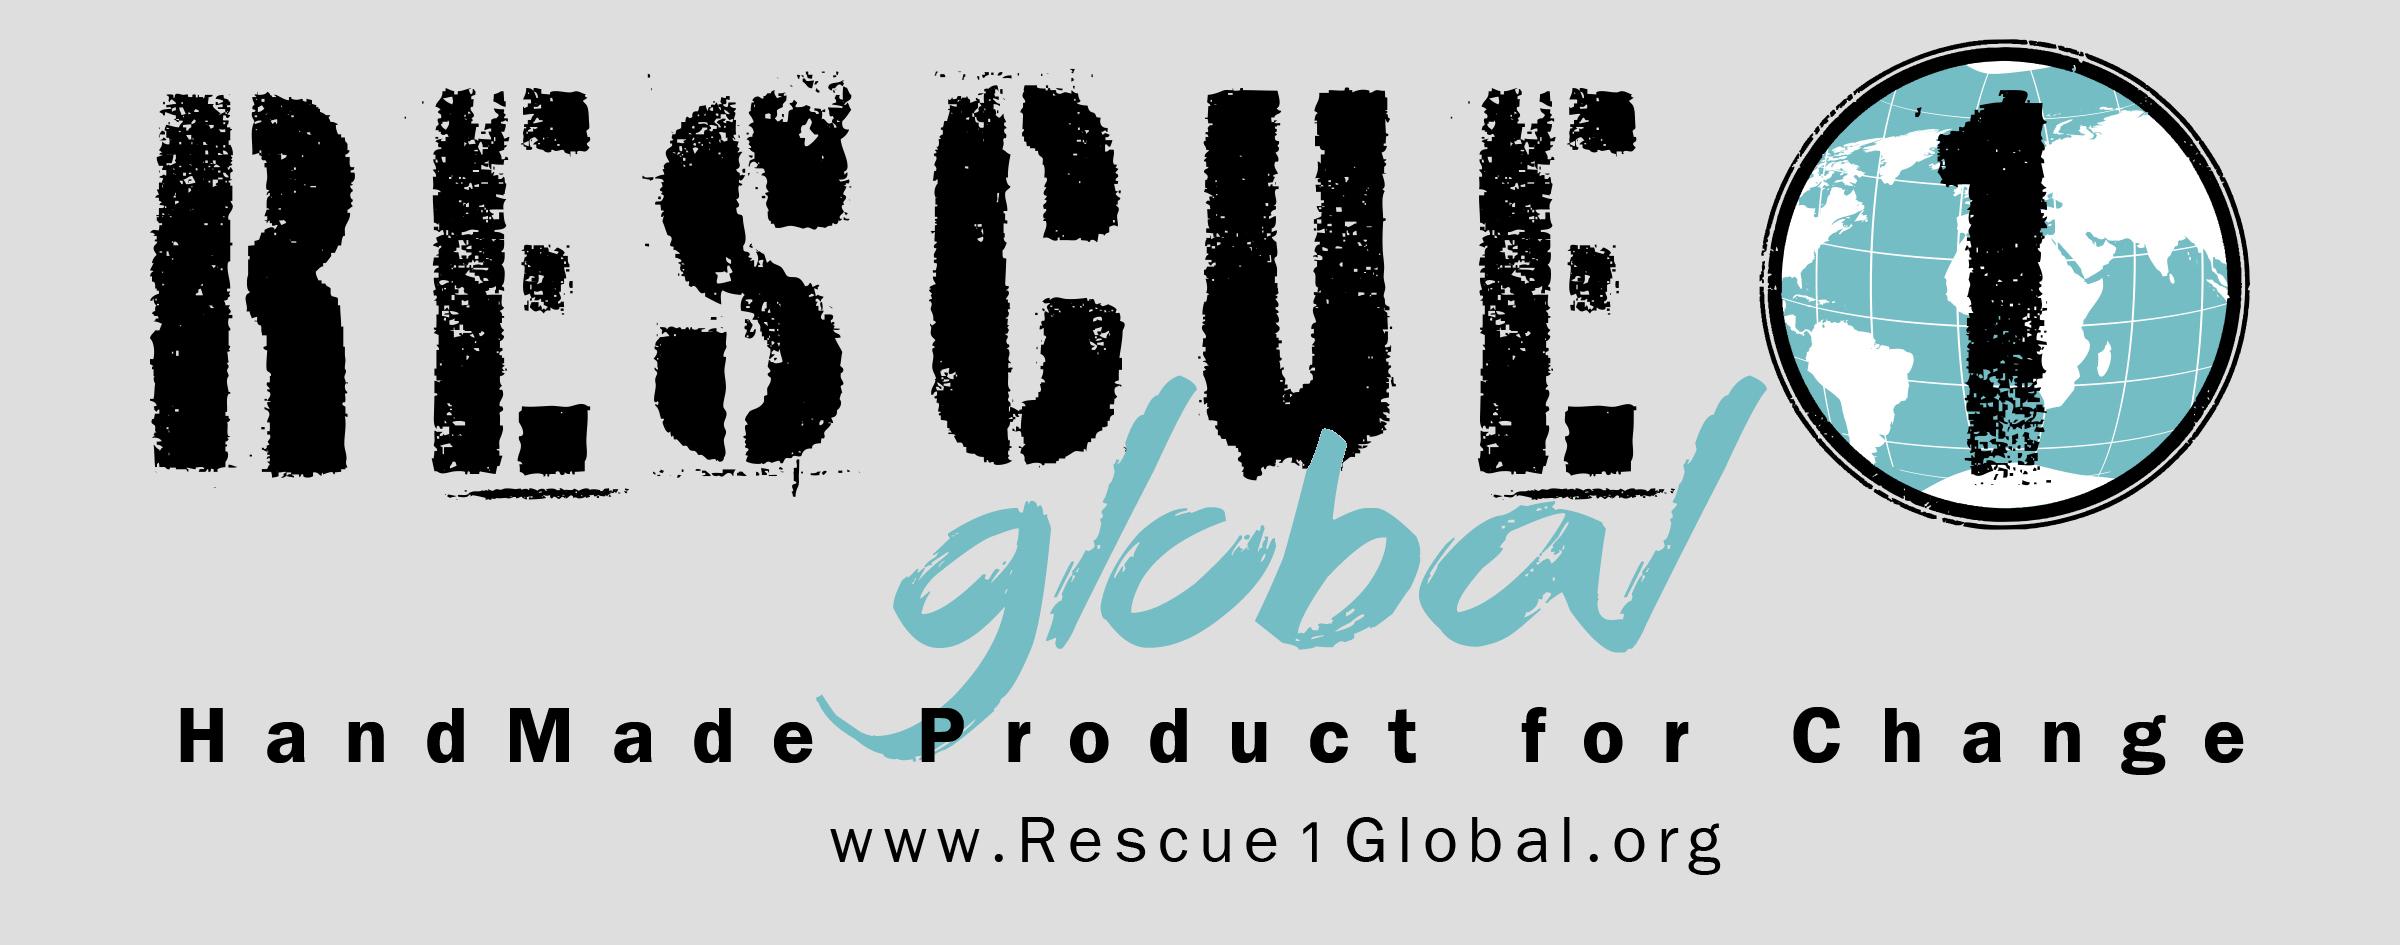 Rescue 1 Global